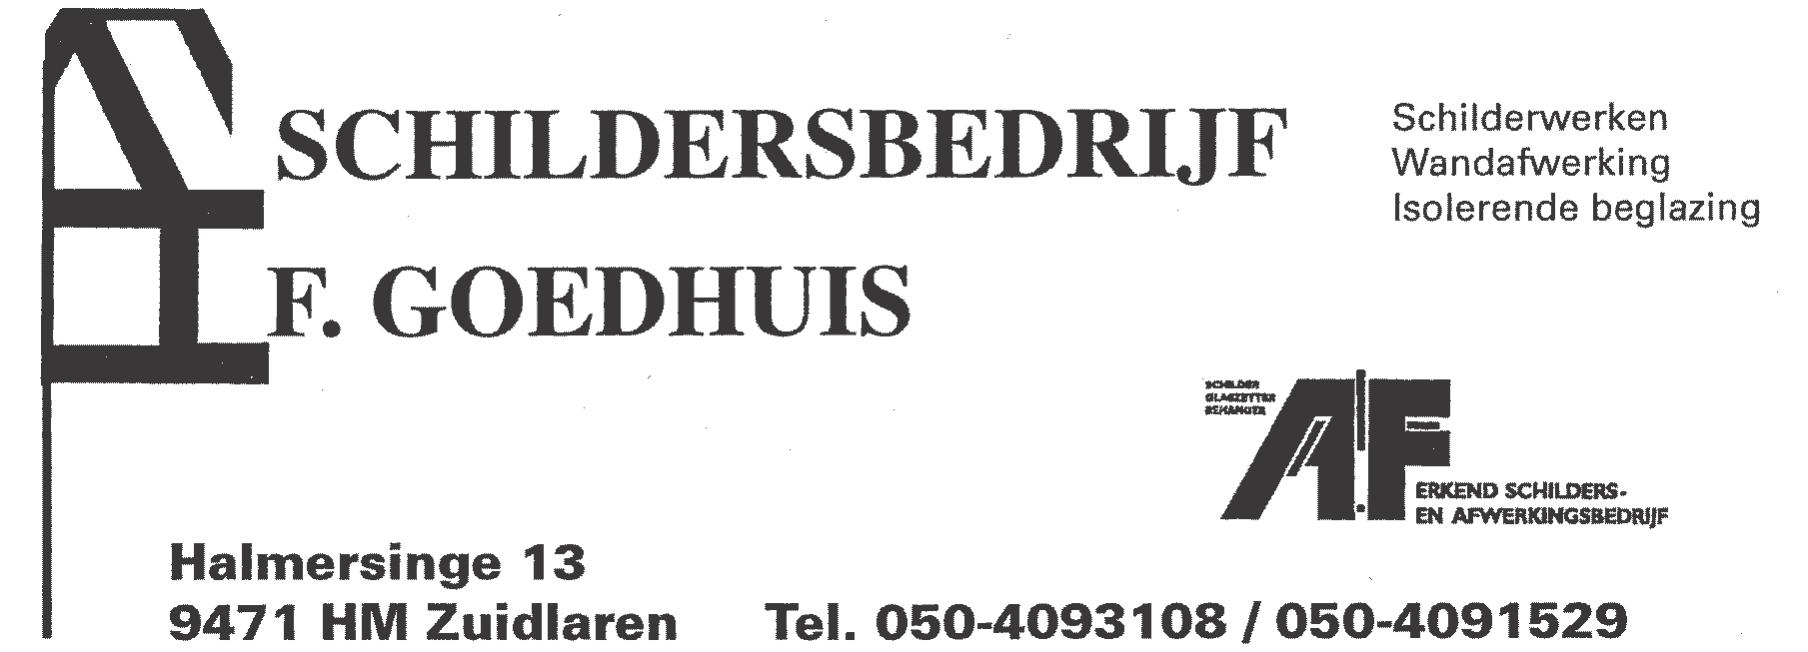 http://noorder-es.nl/wp-content/uploads/2018/07/goedhuis-schilder.png